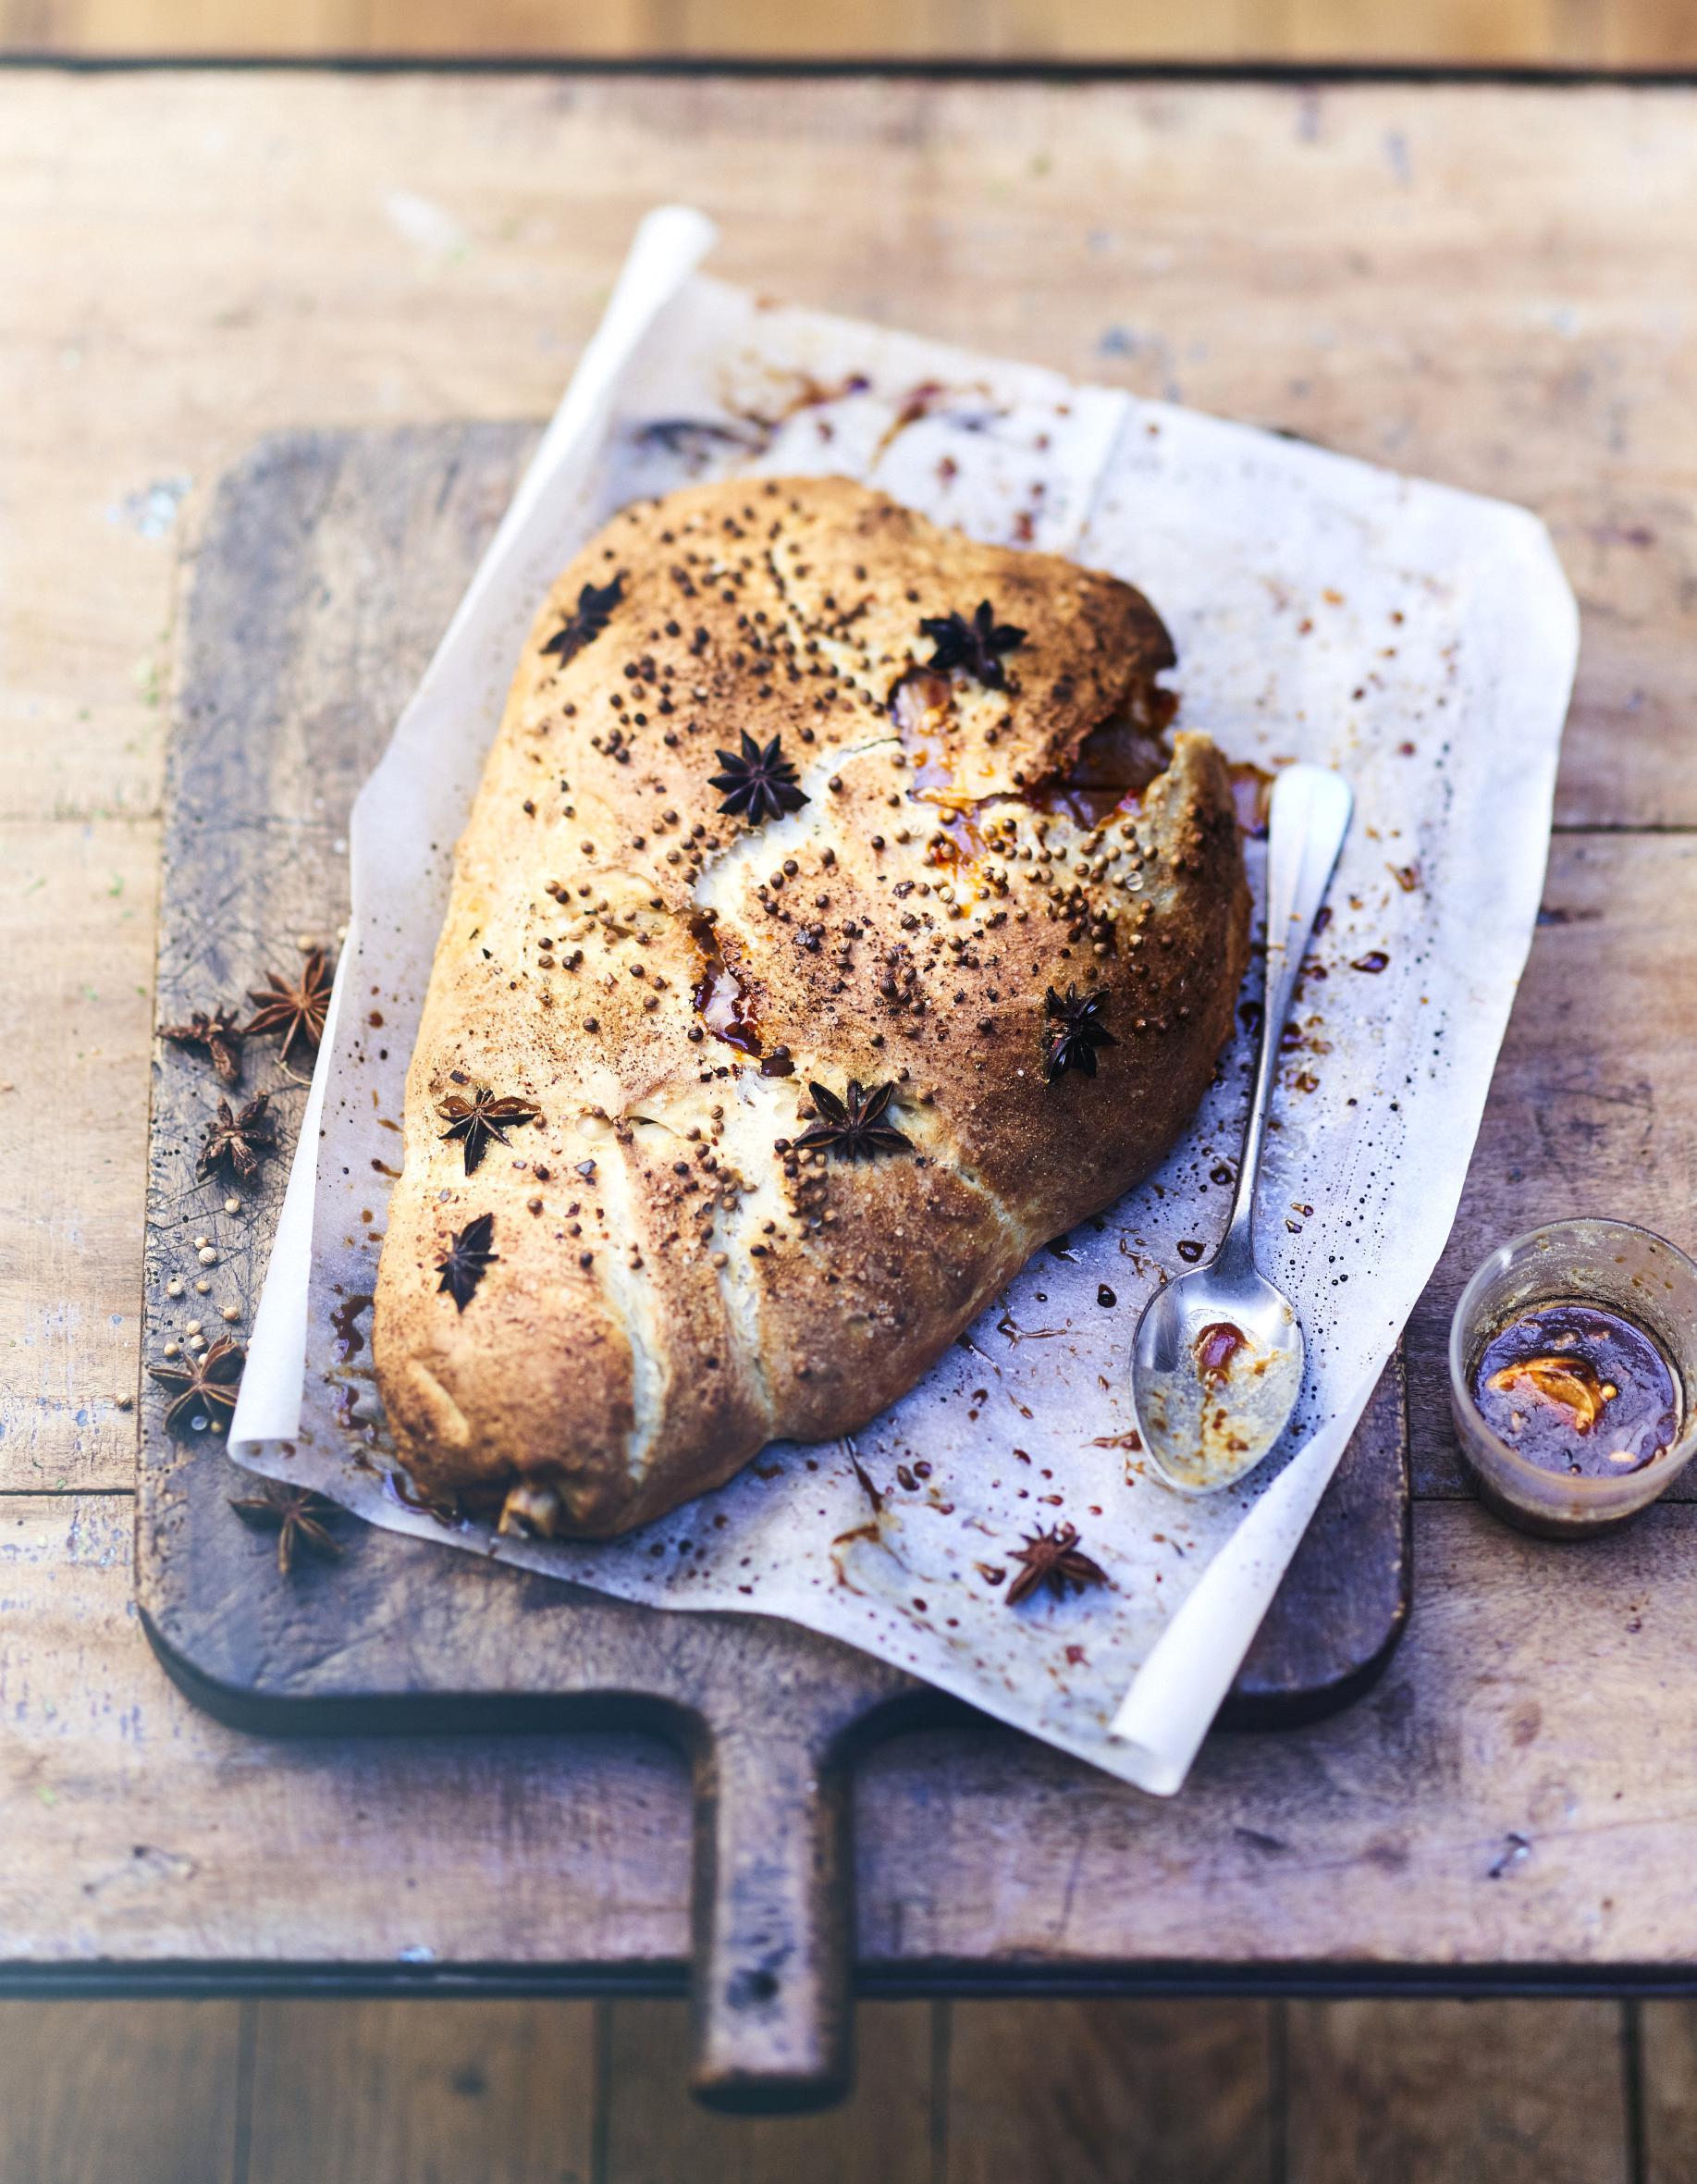 Gigot d'agneau en croûte de pain